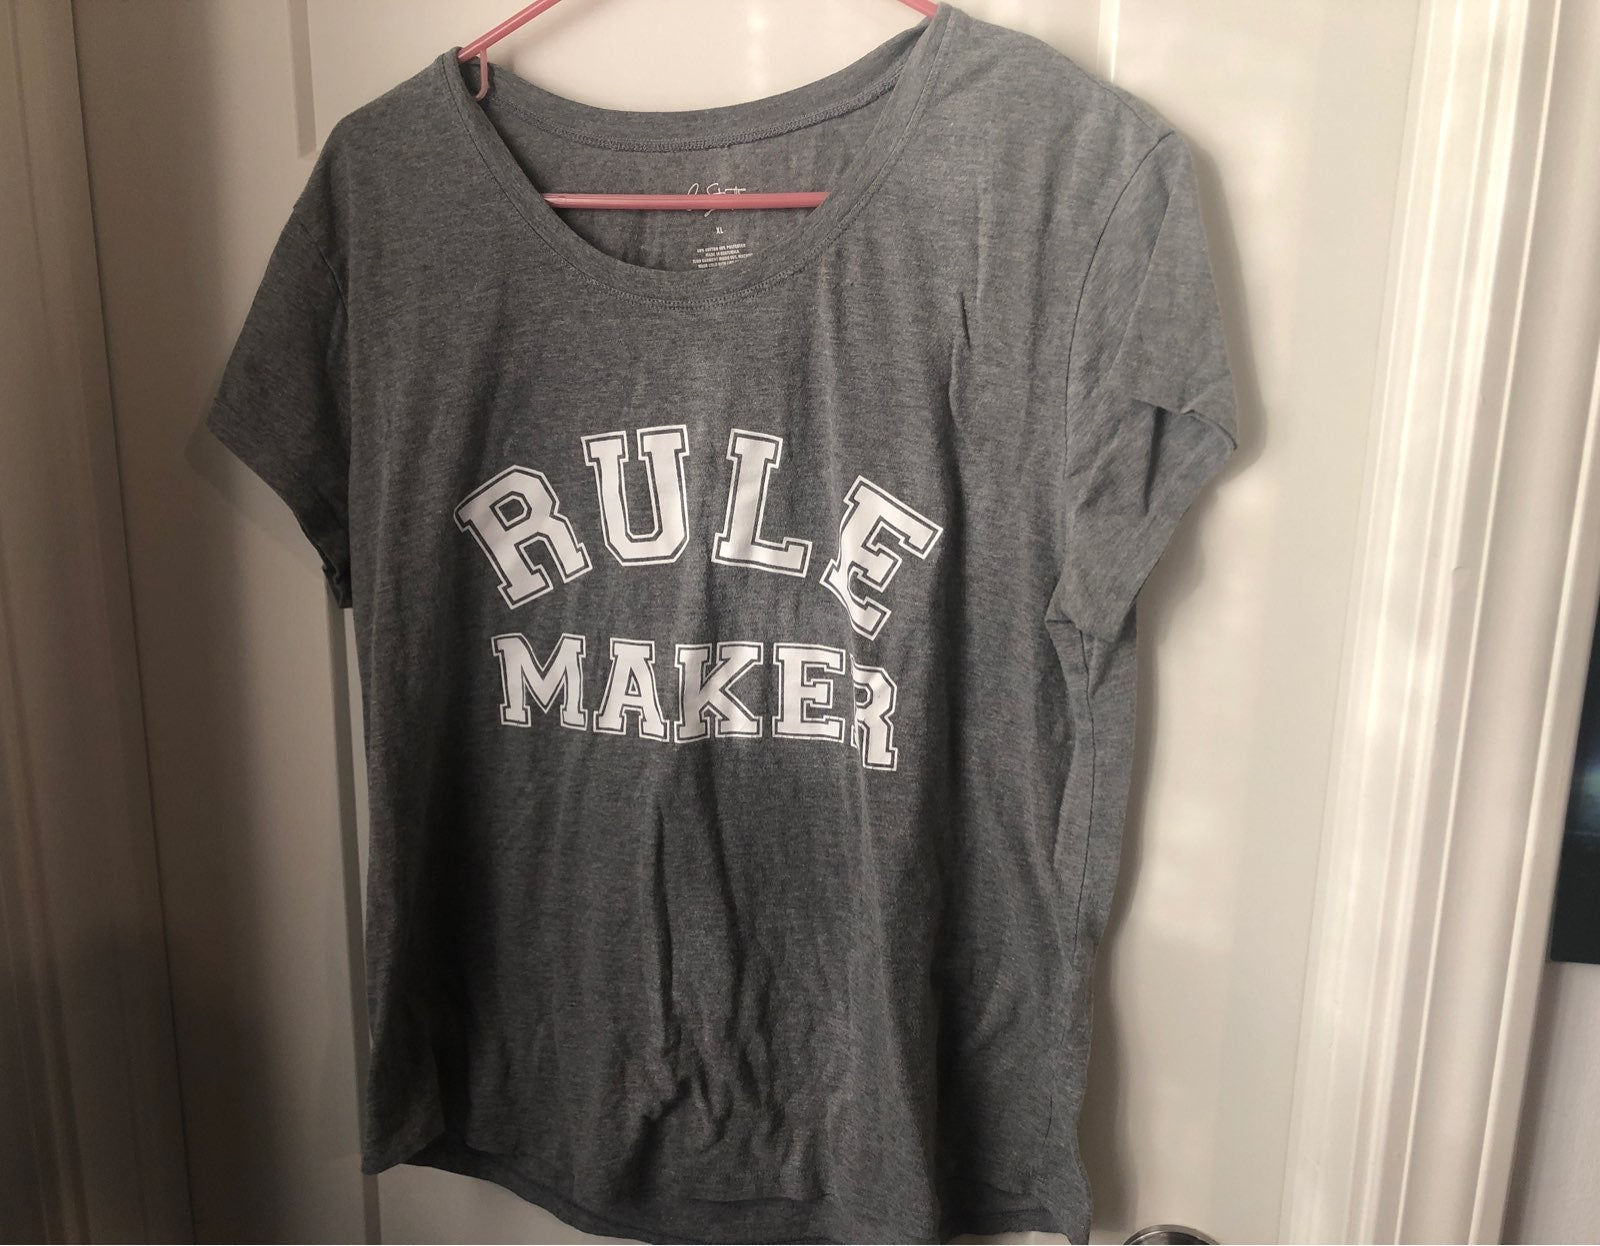 Rule maker shirt